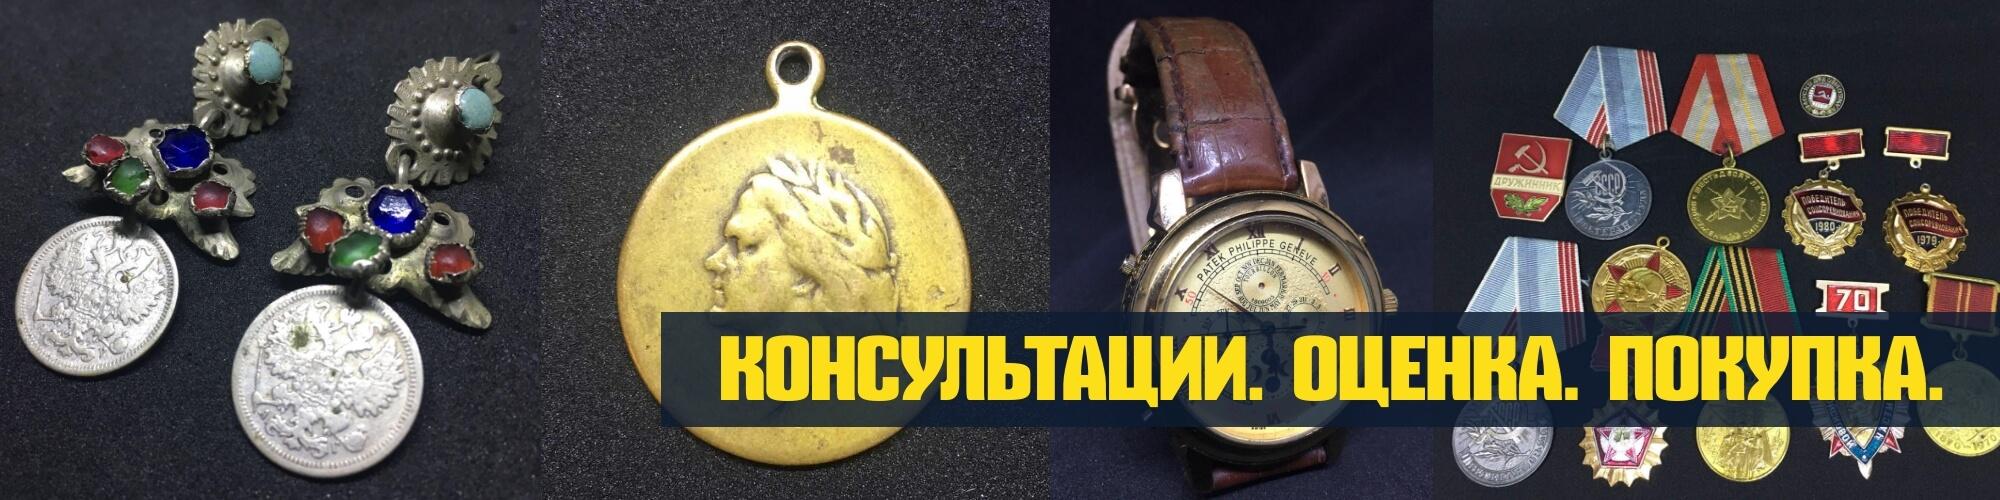 скупка антиквариата Харьков